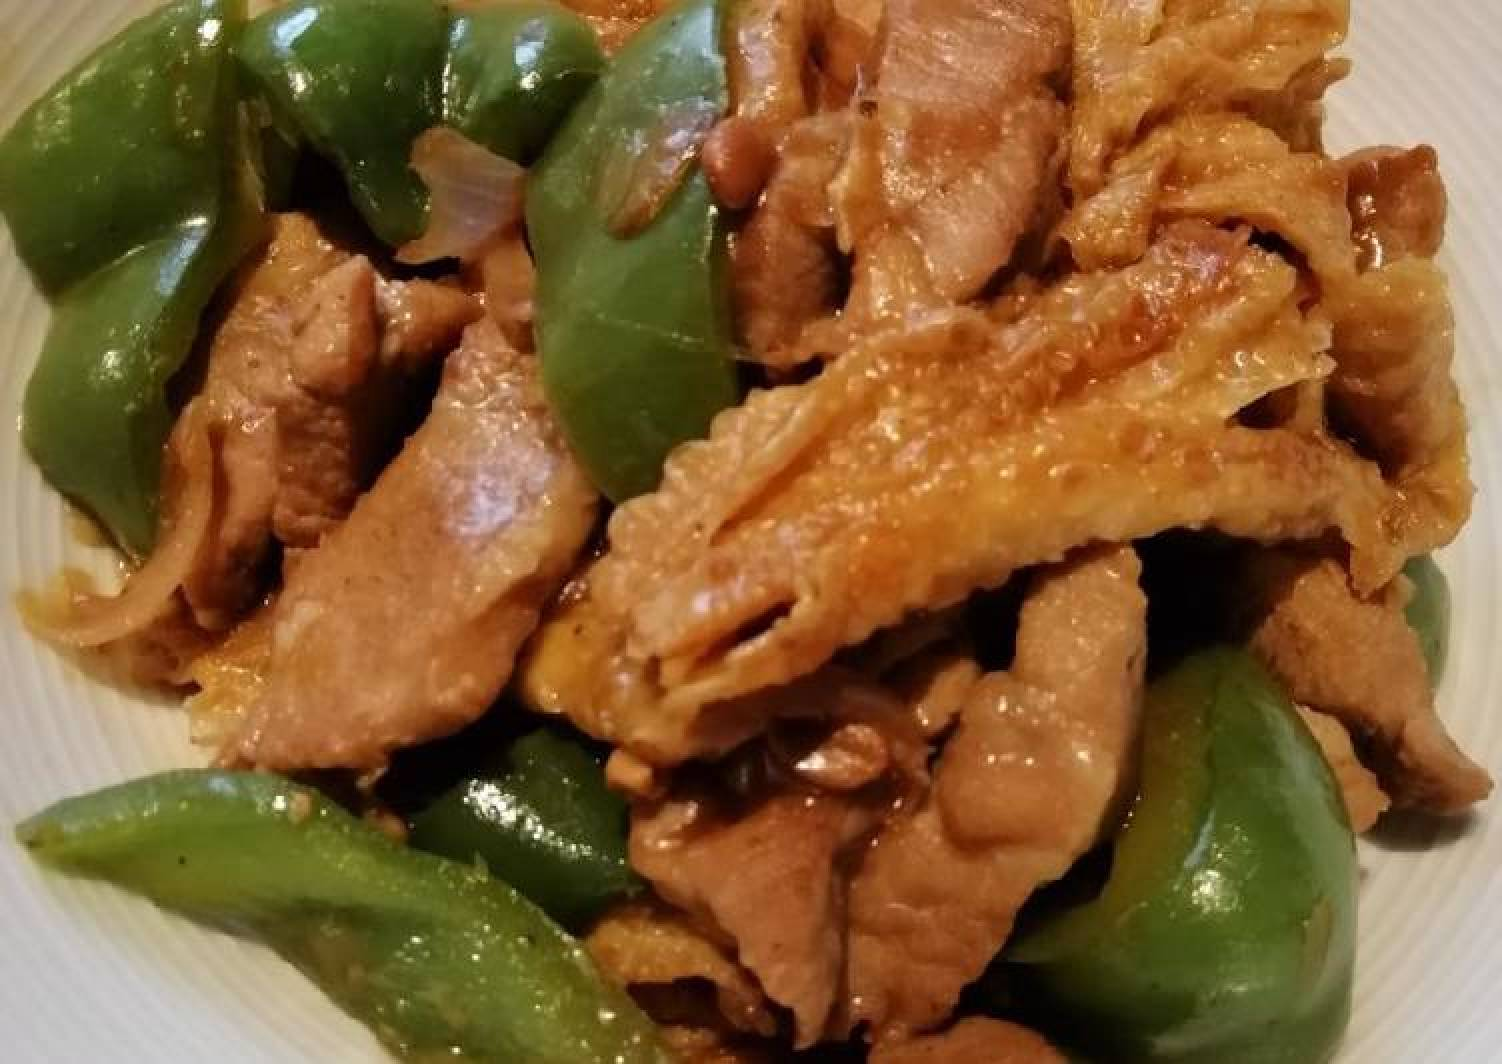 Stir Fry Pork Meat